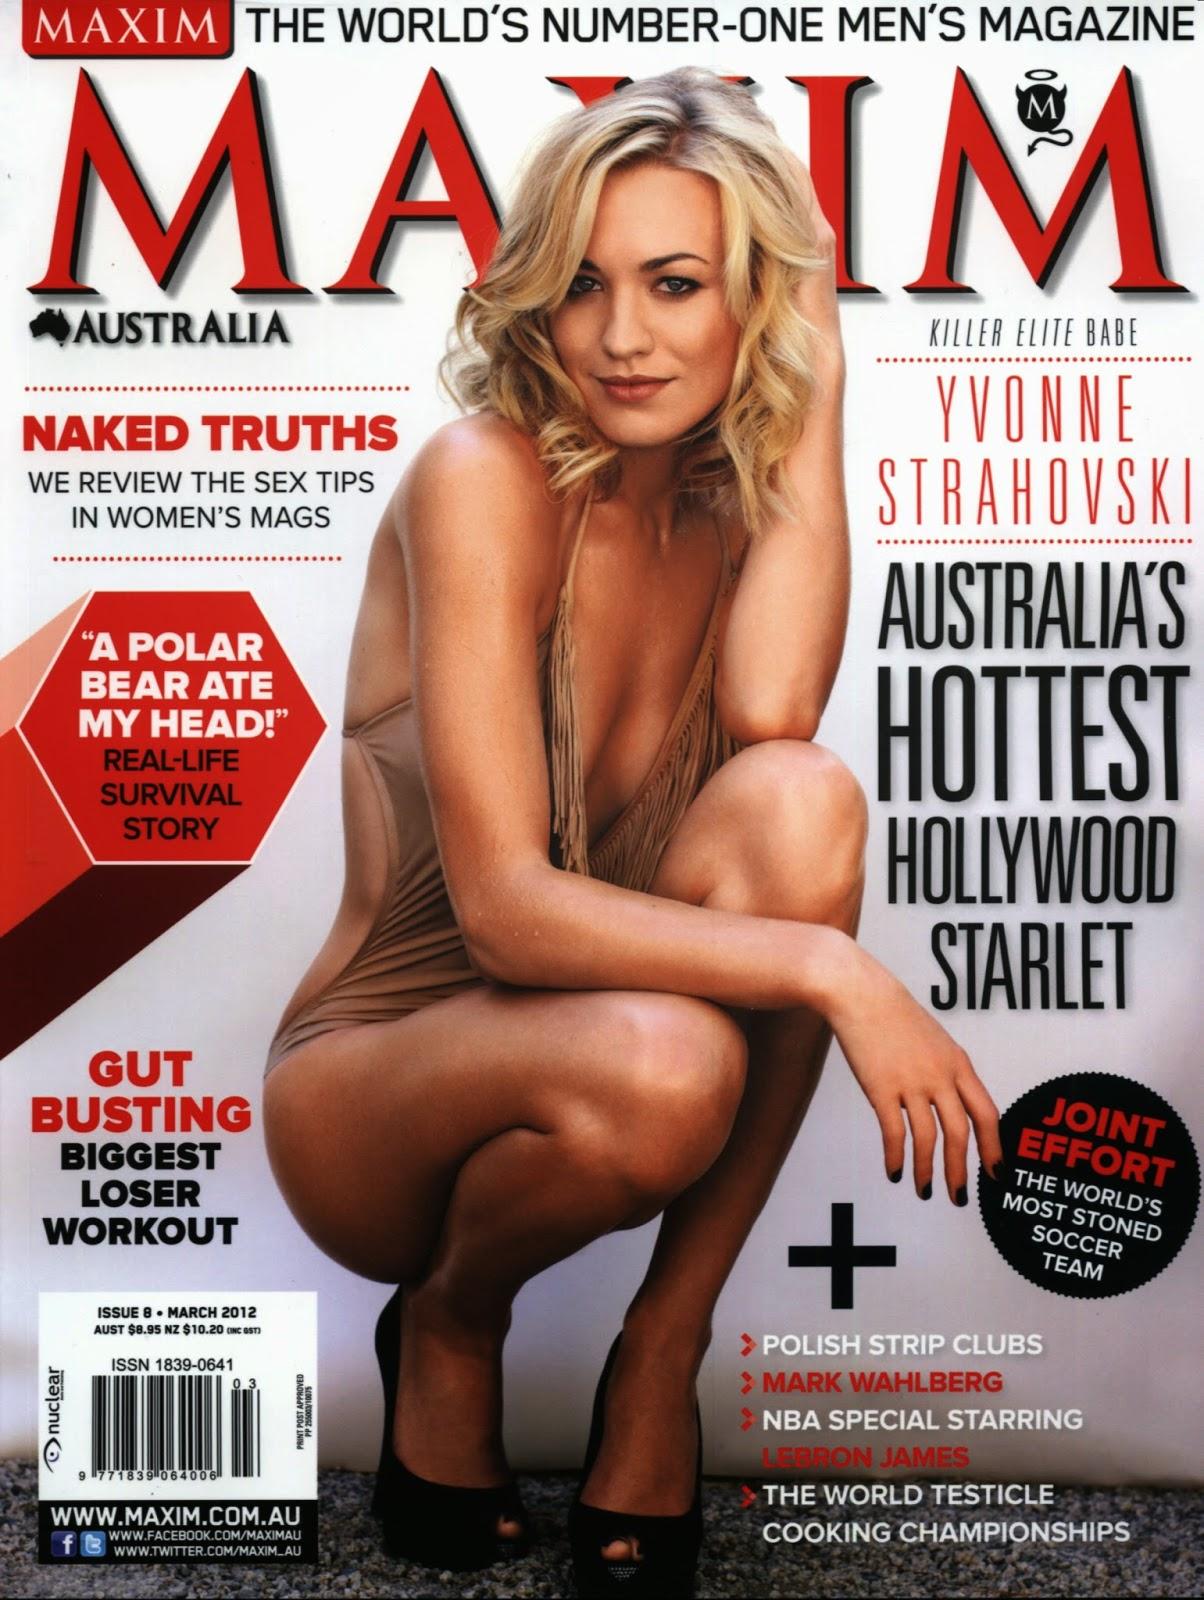 World Hot Actress Yvonne Strahovski Hot Sexy Maxim March 2012 Covers Hq Stills Photos